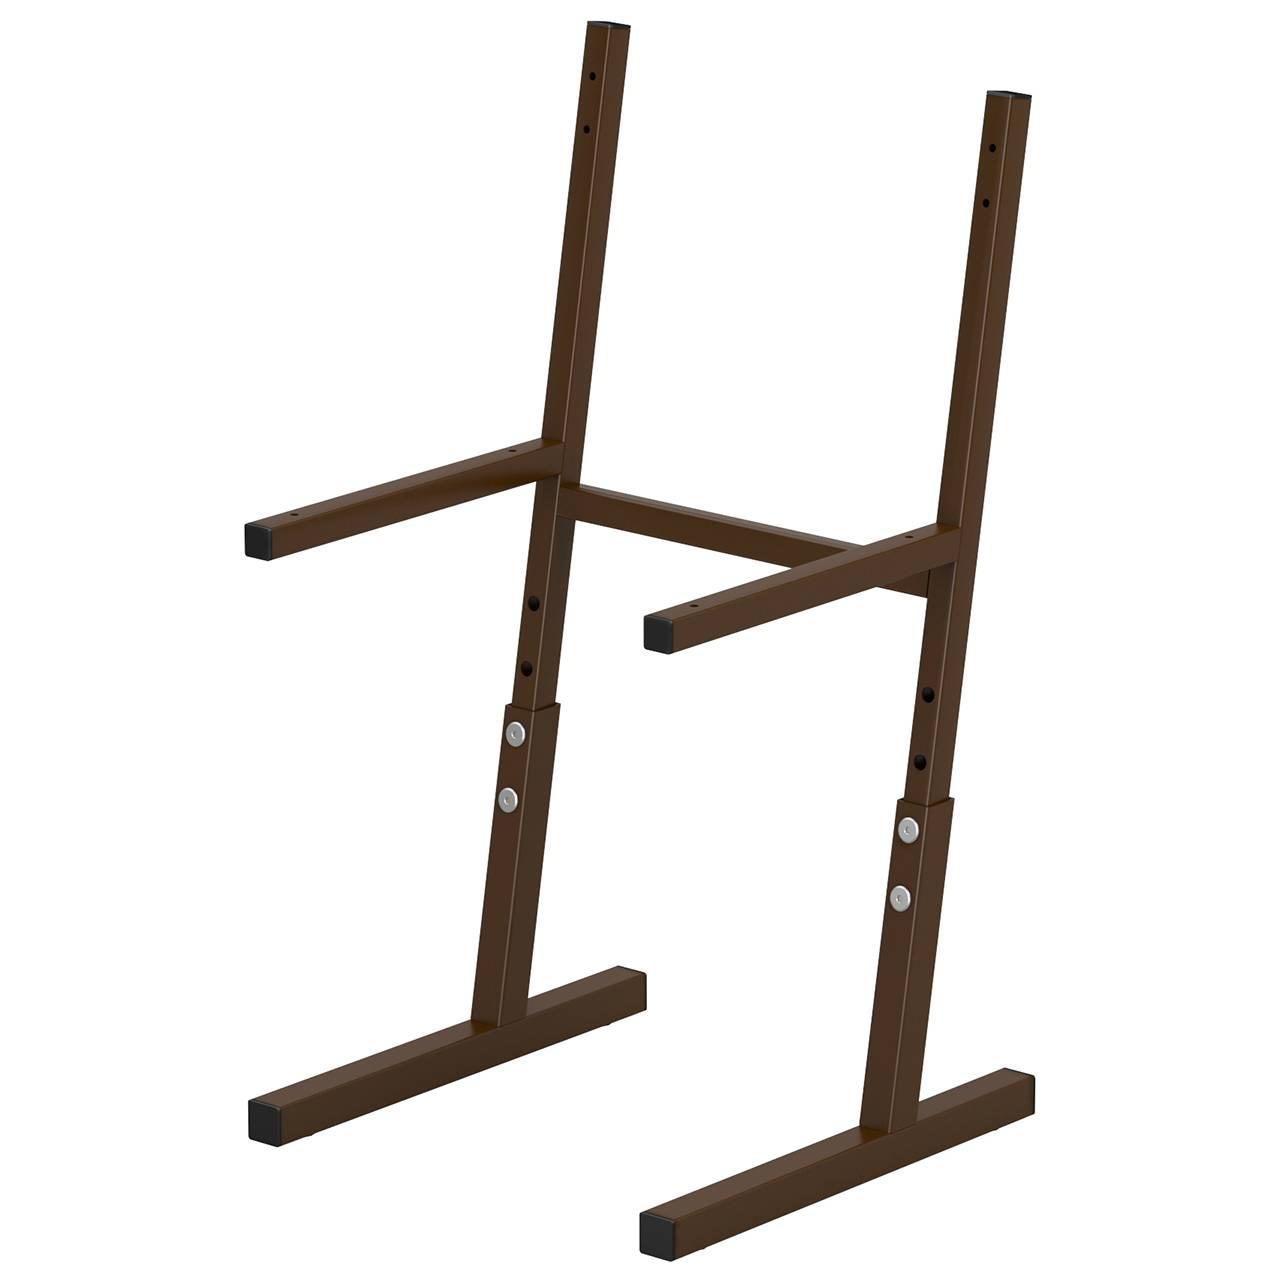 Металлокаркас стула ученического (гр. 3-5, 4-6) коричневый 4-6